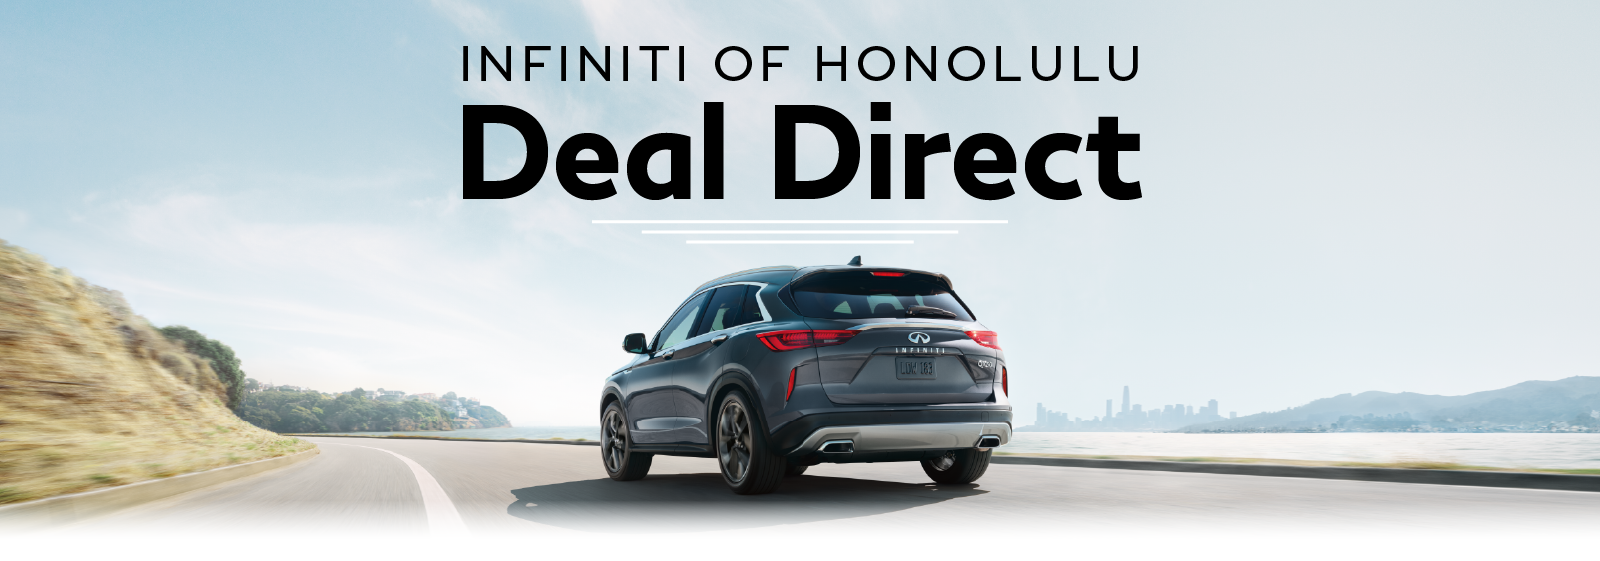 INFINITI of honolulu Deal Direct